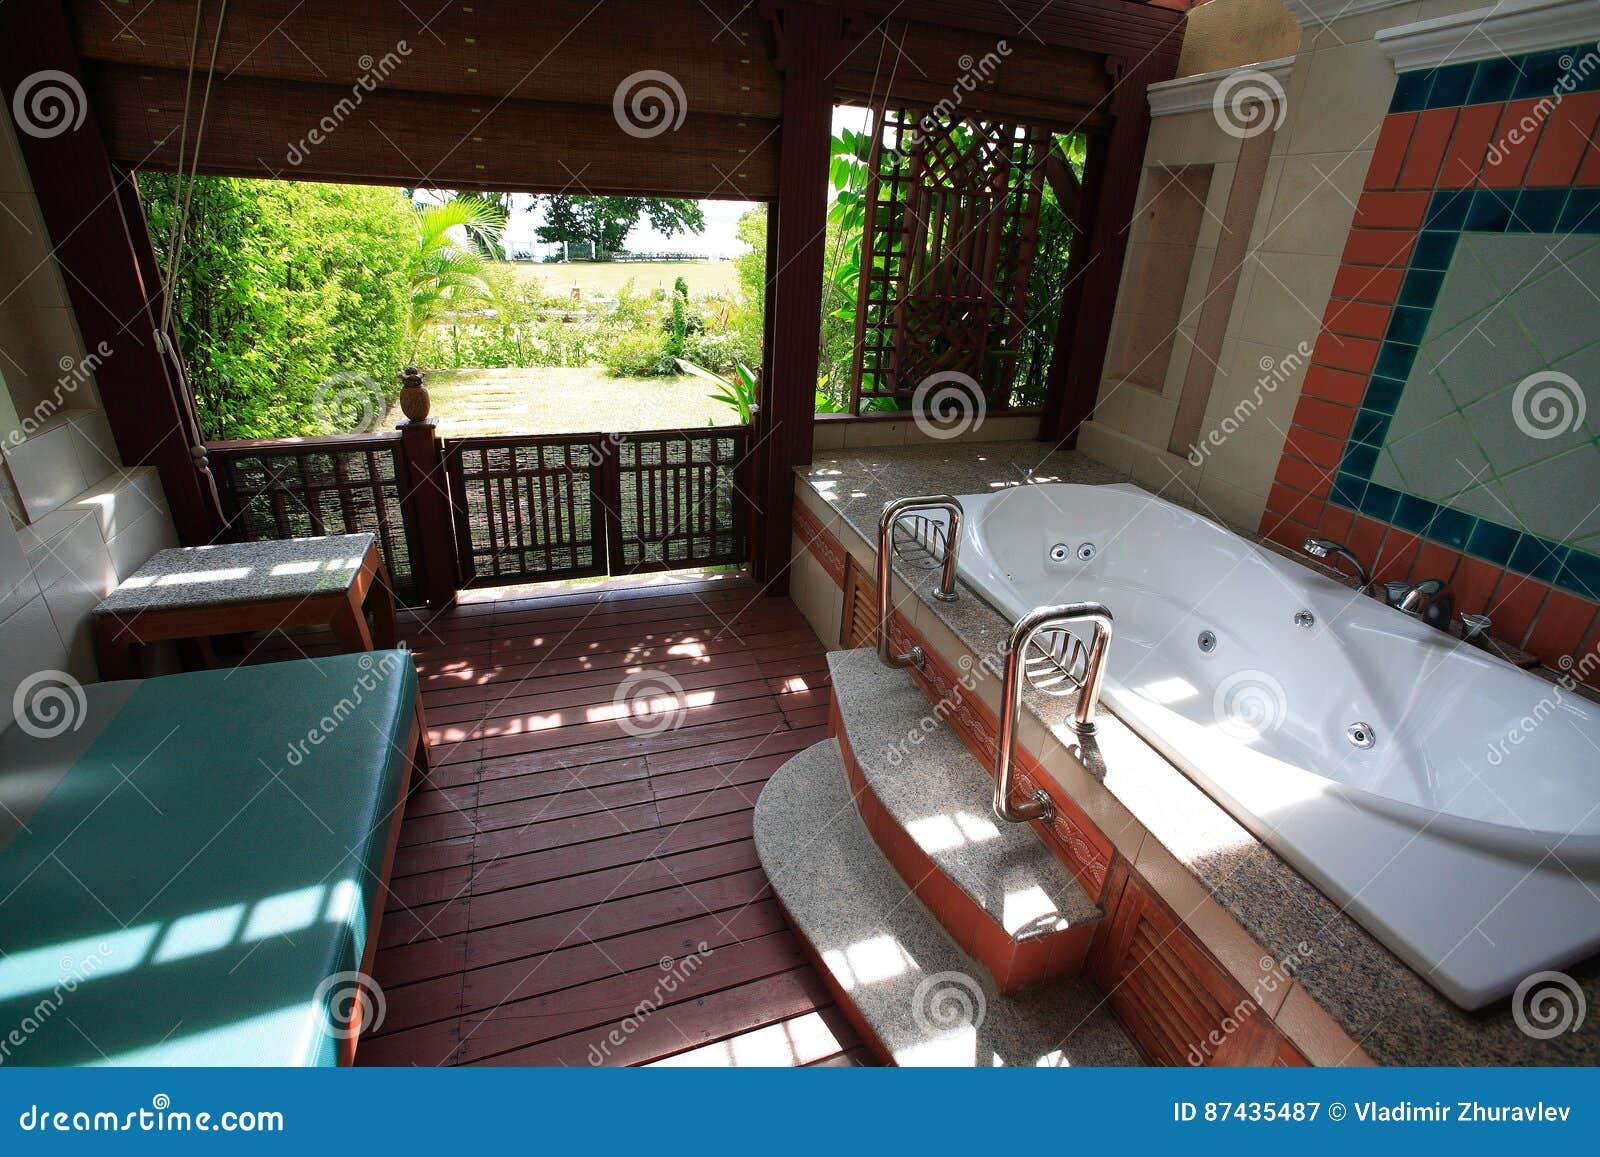 Wc En Badkamers : Kleine badkamer met bad en wc eigen huis en tuin